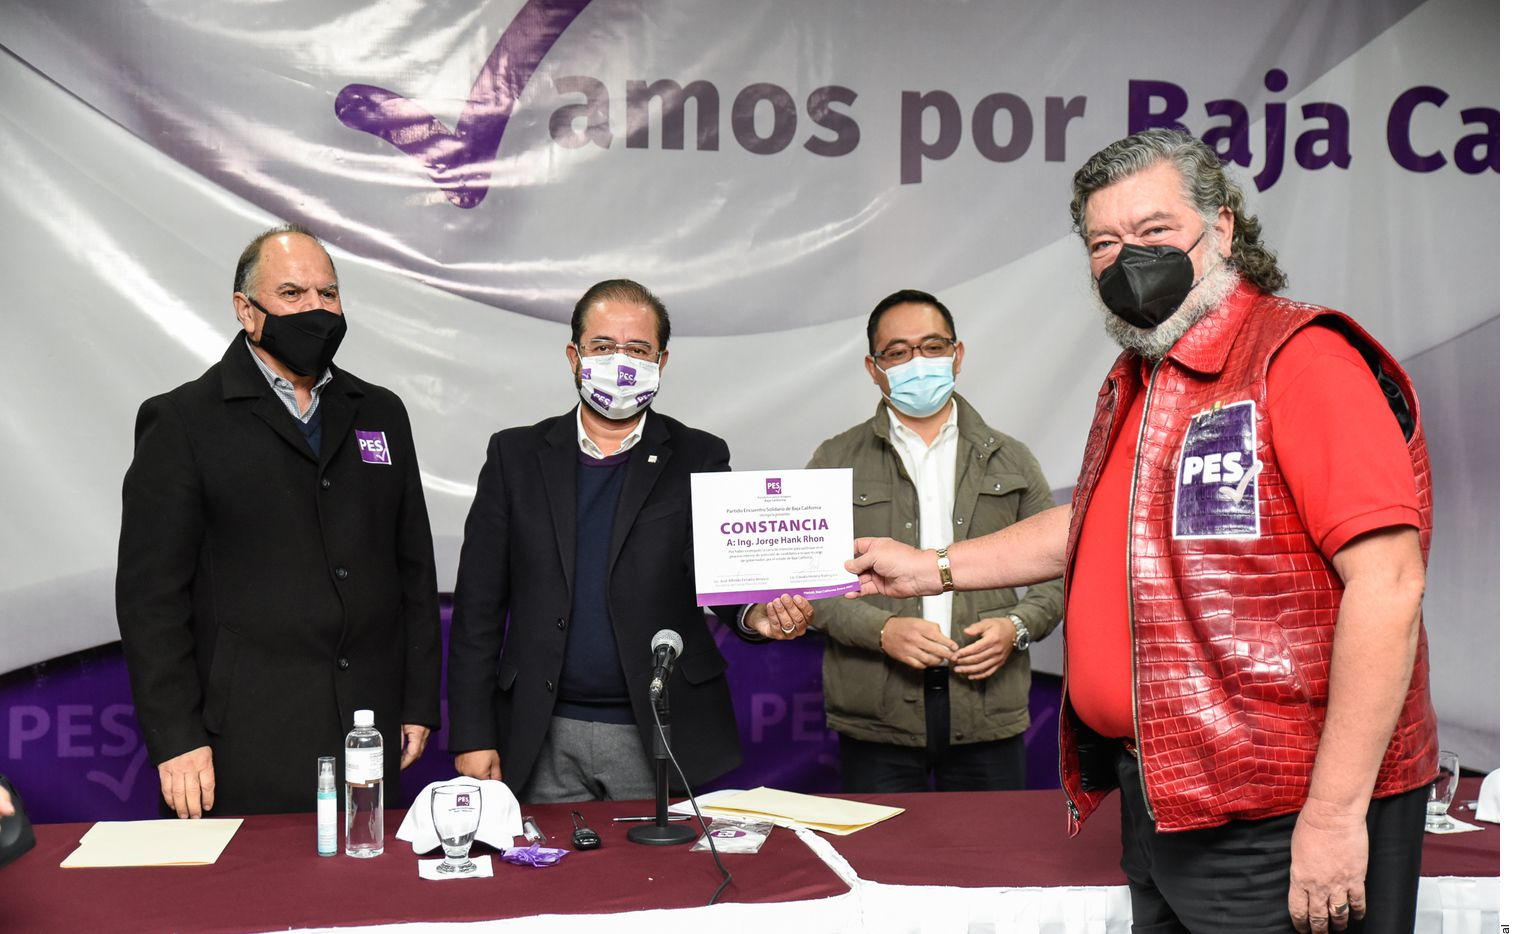 Al término de un evento en Mexicali, Jorge Hank Rhon, candidato del PES a Gubernatura de BC, llamó 'basura' a su contrincante Lupita Jones.